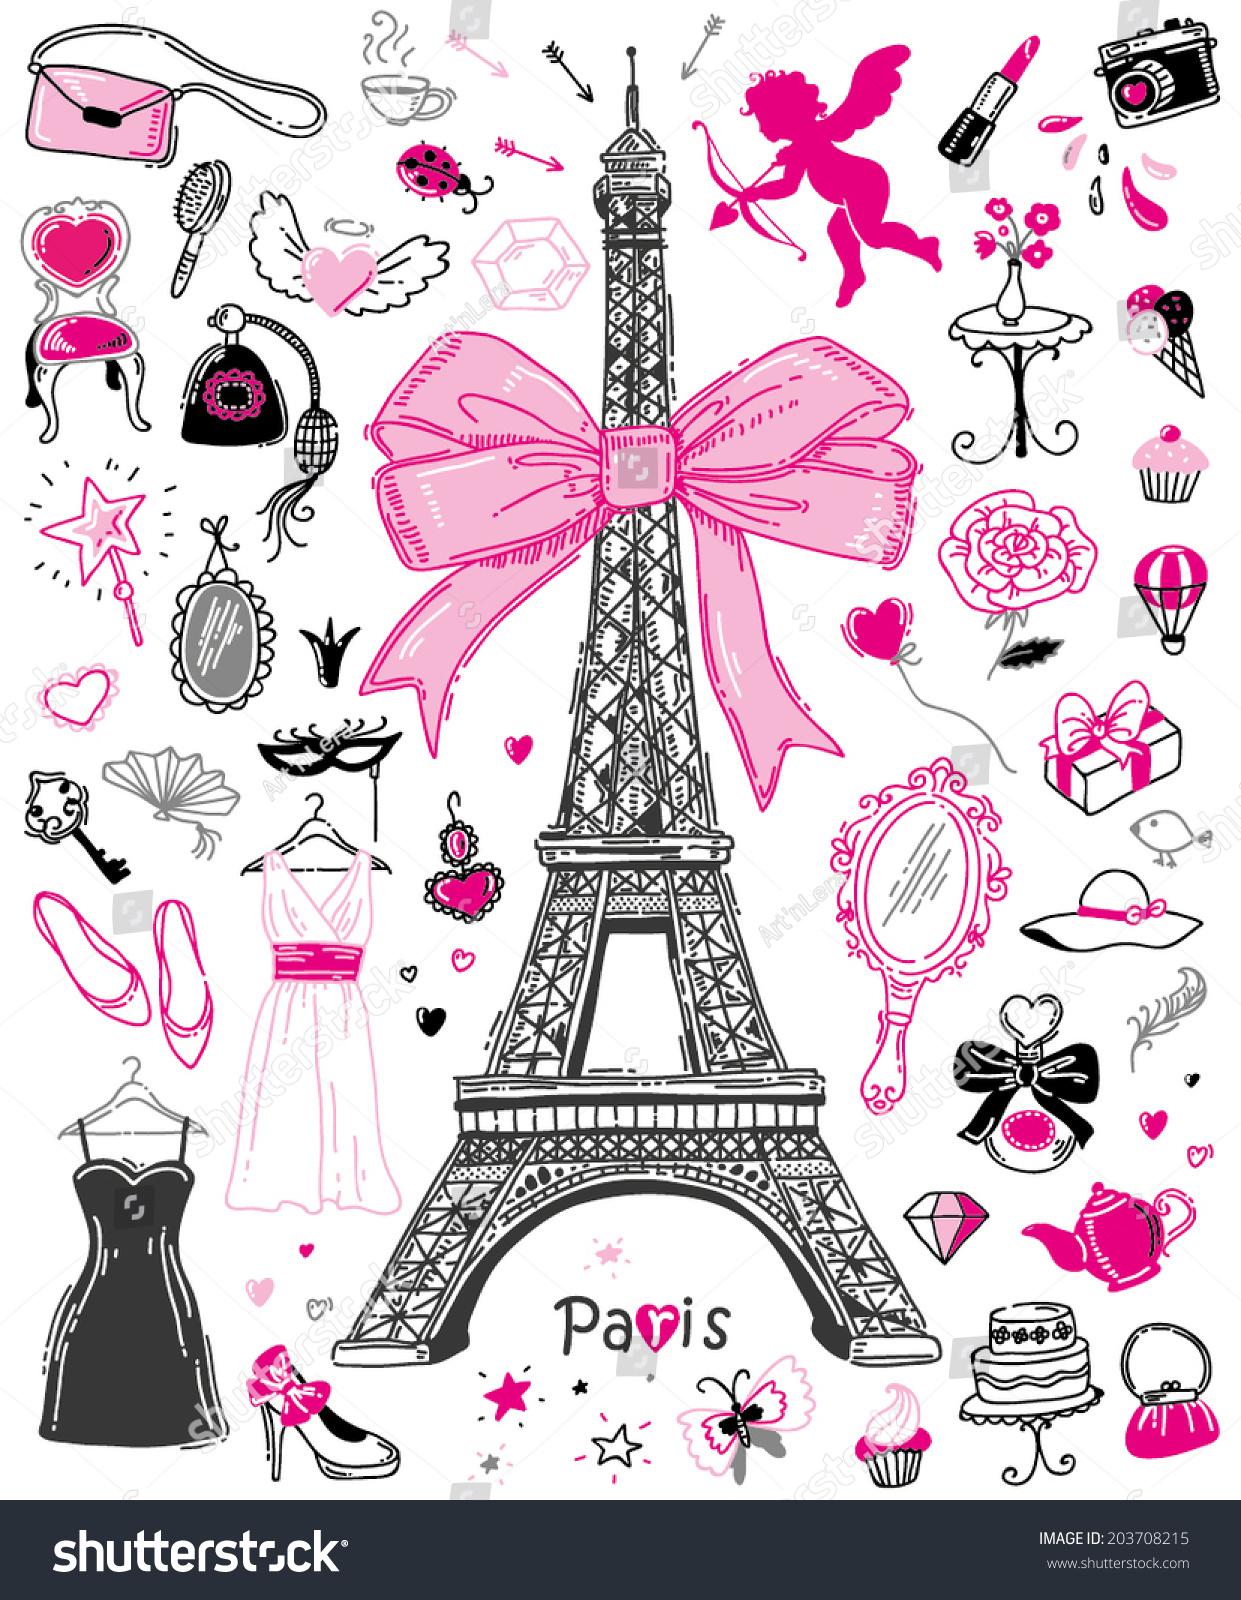 1000 Paris Illustrated Stock S & Vectors